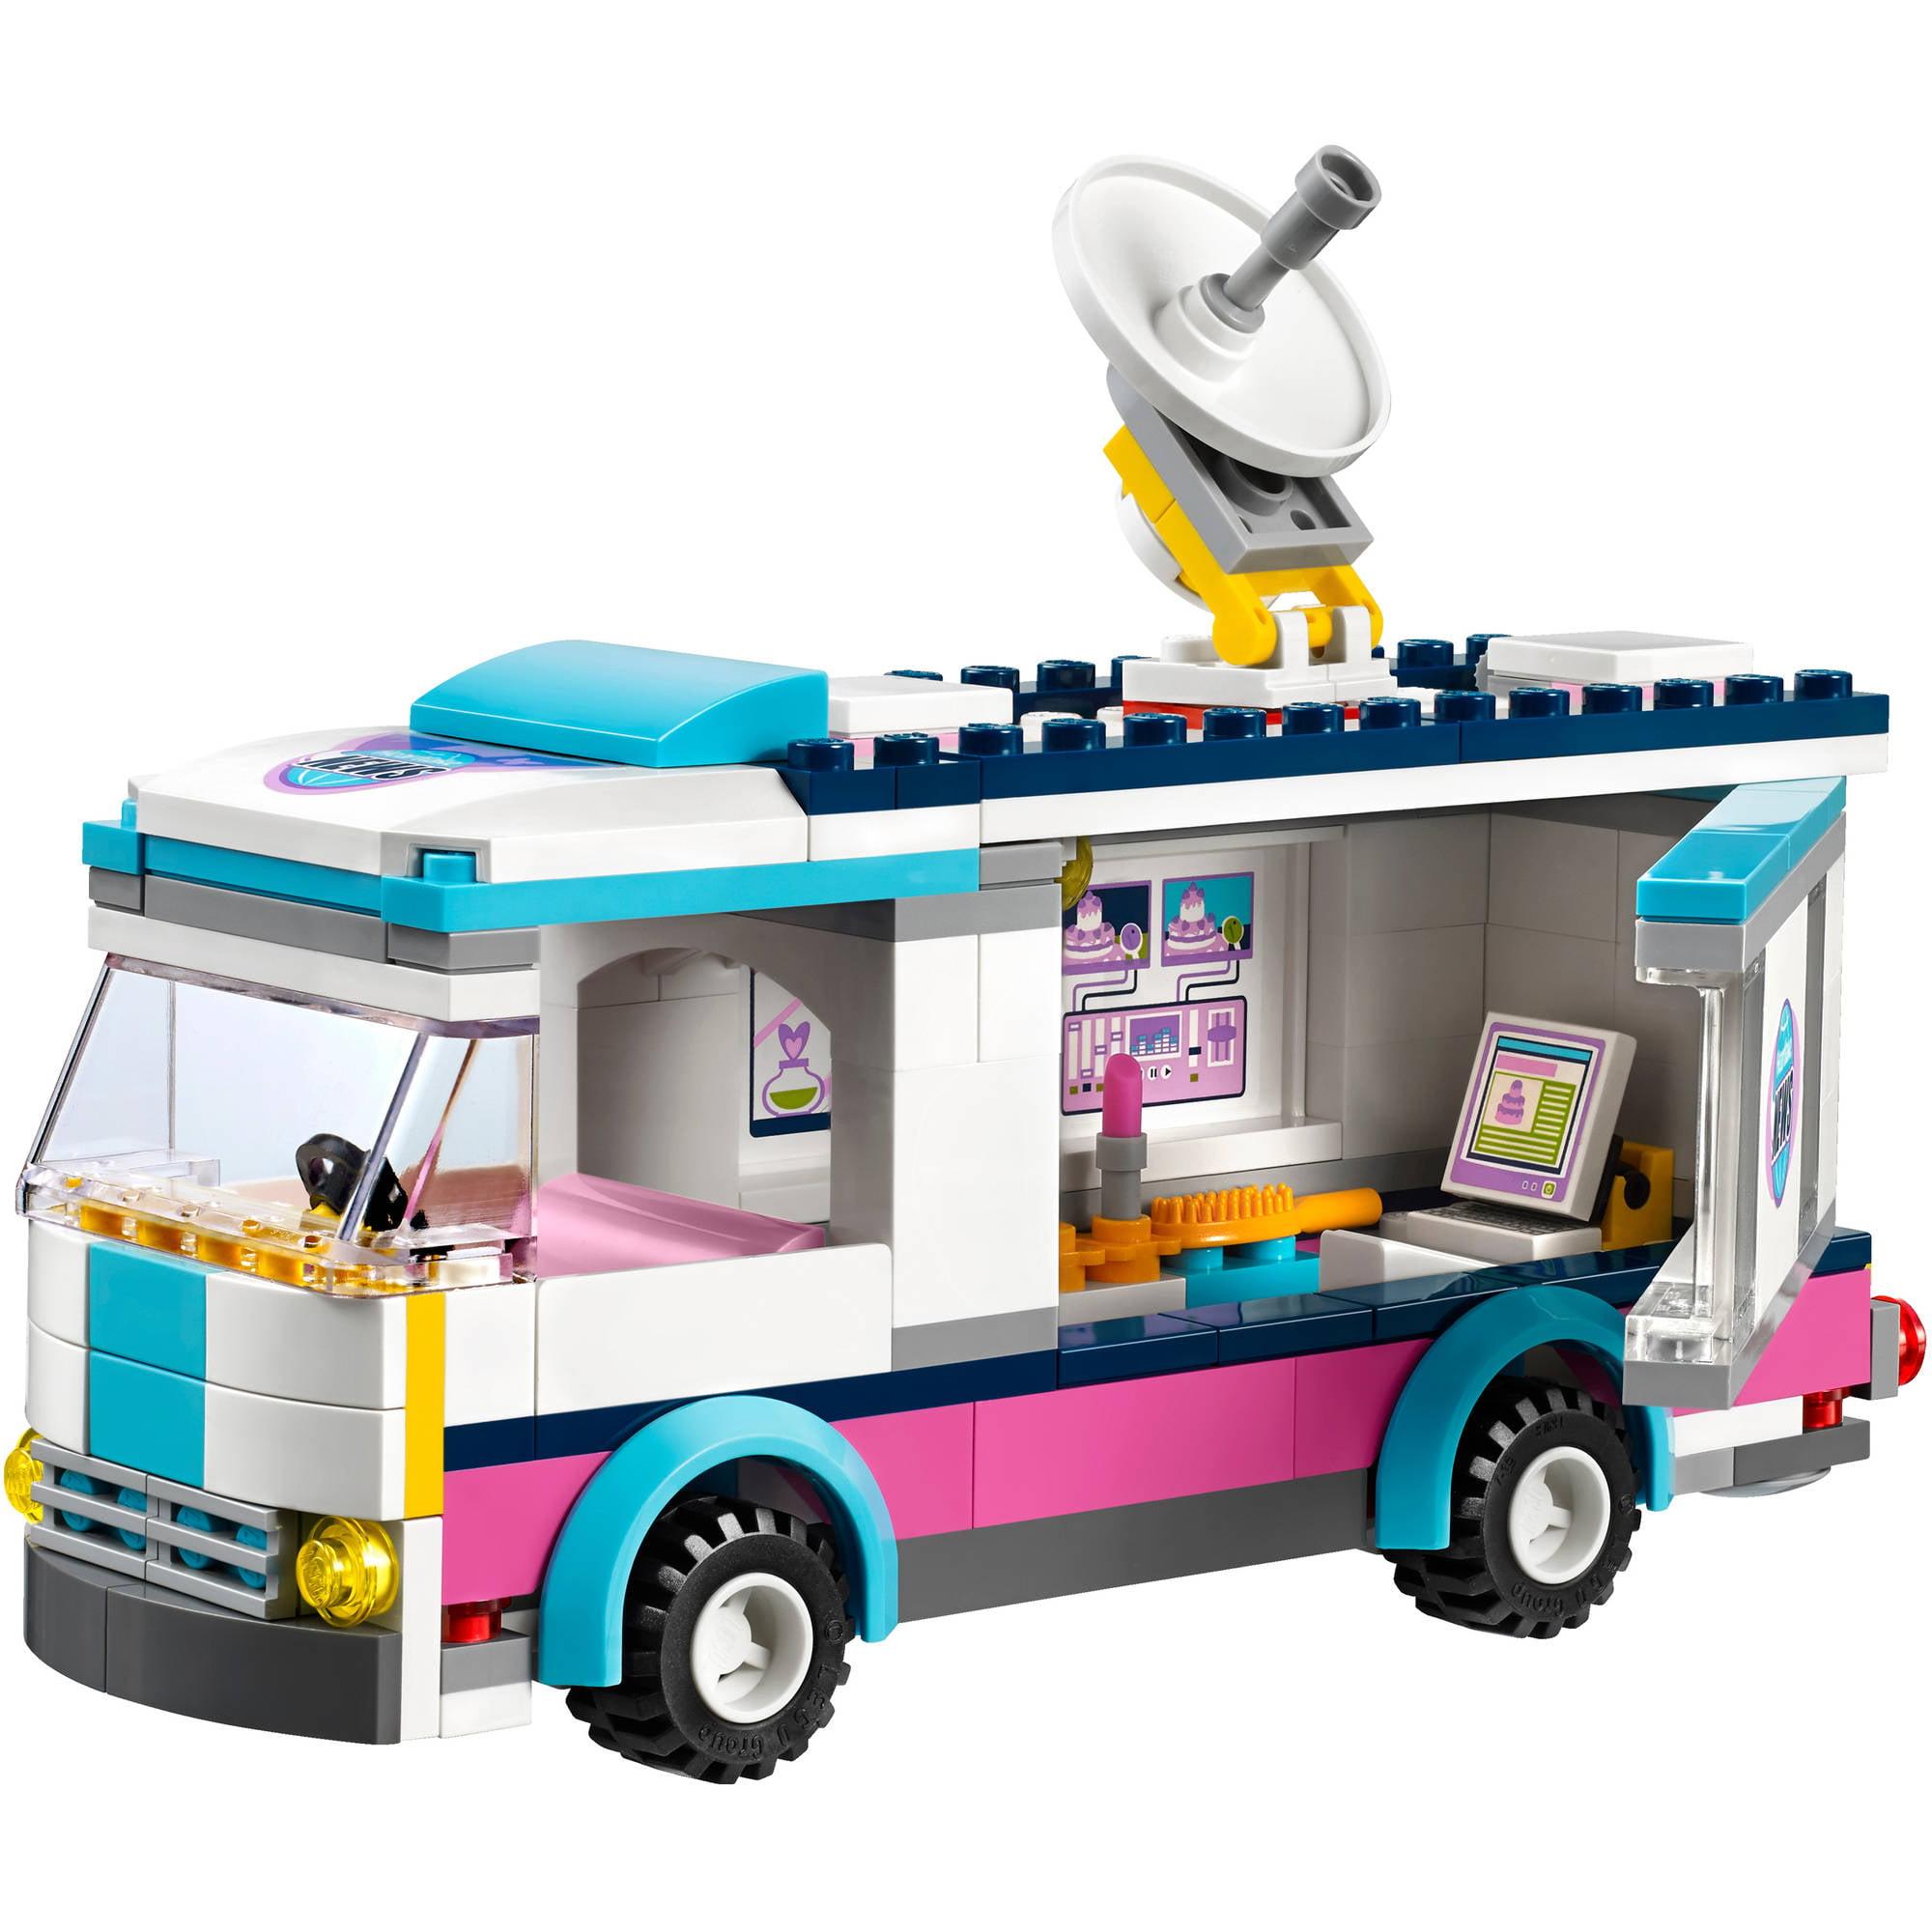 Lego Friends Set 41056 Heartlake News Van Walmart